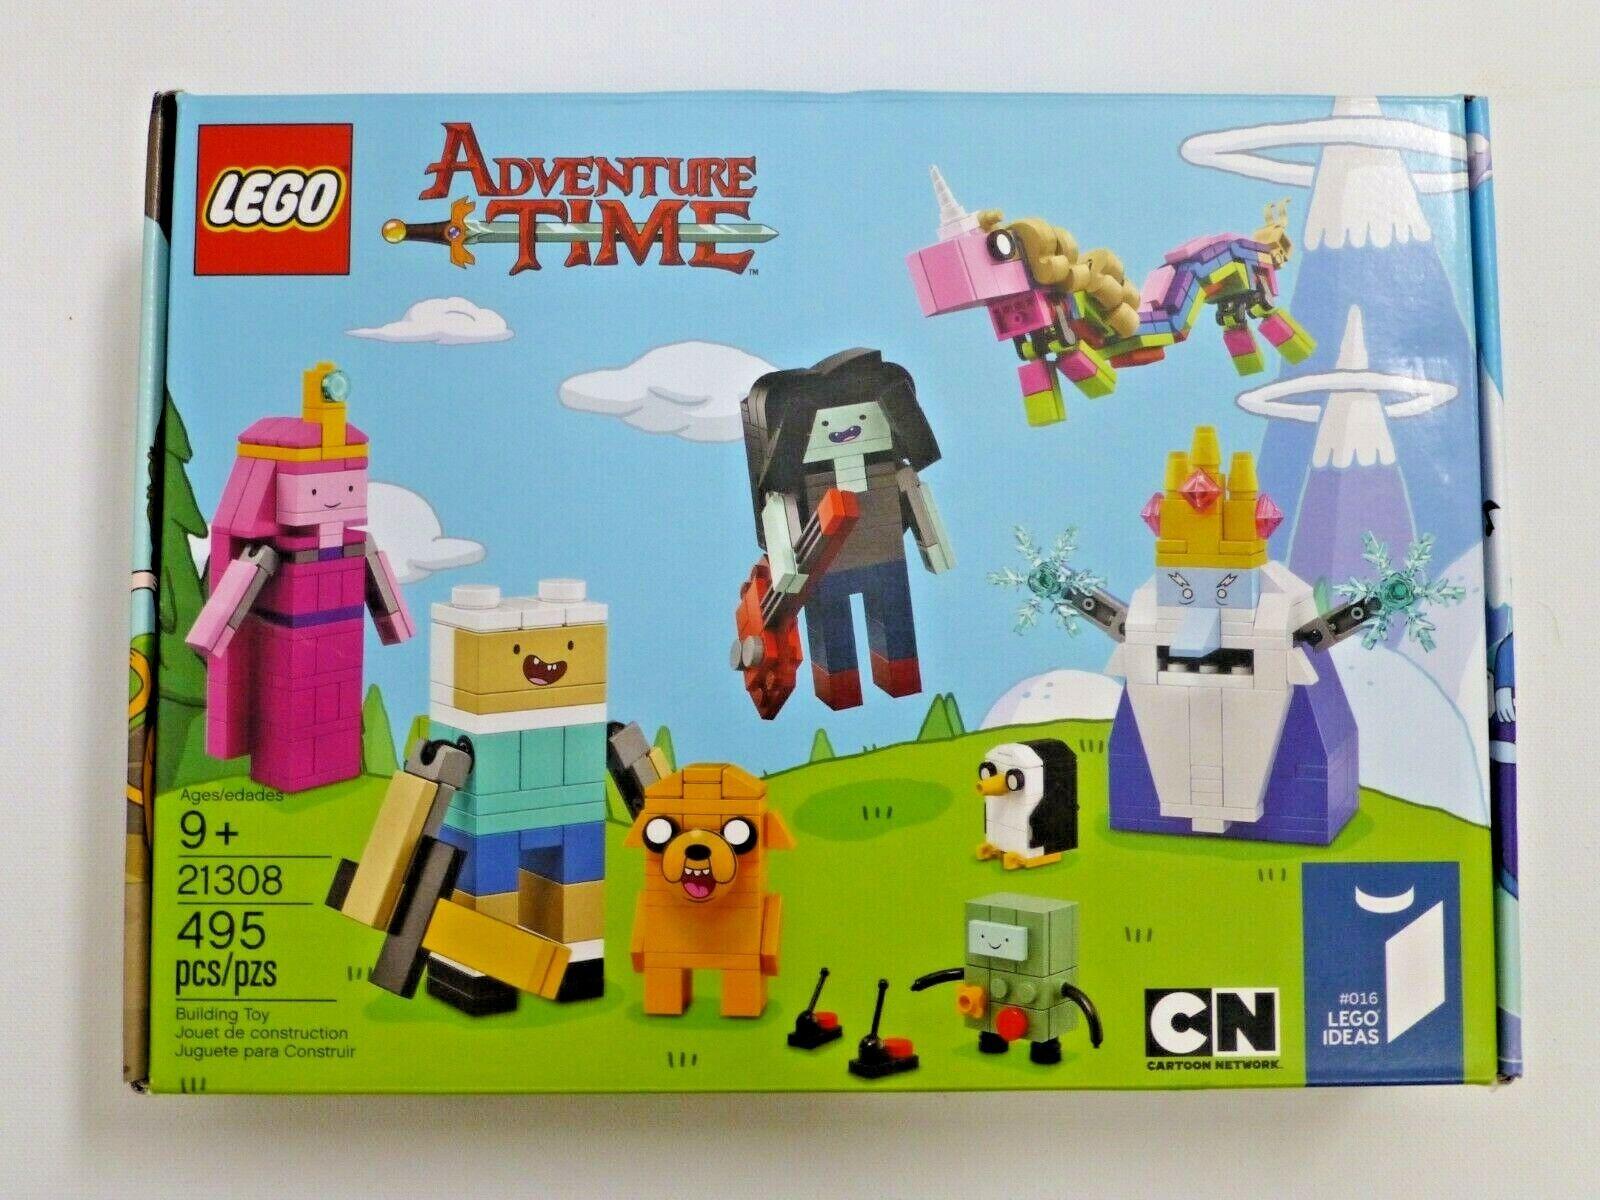 LEGO Adventure Time (21308) (21308) (21308) NEW 4c0f68